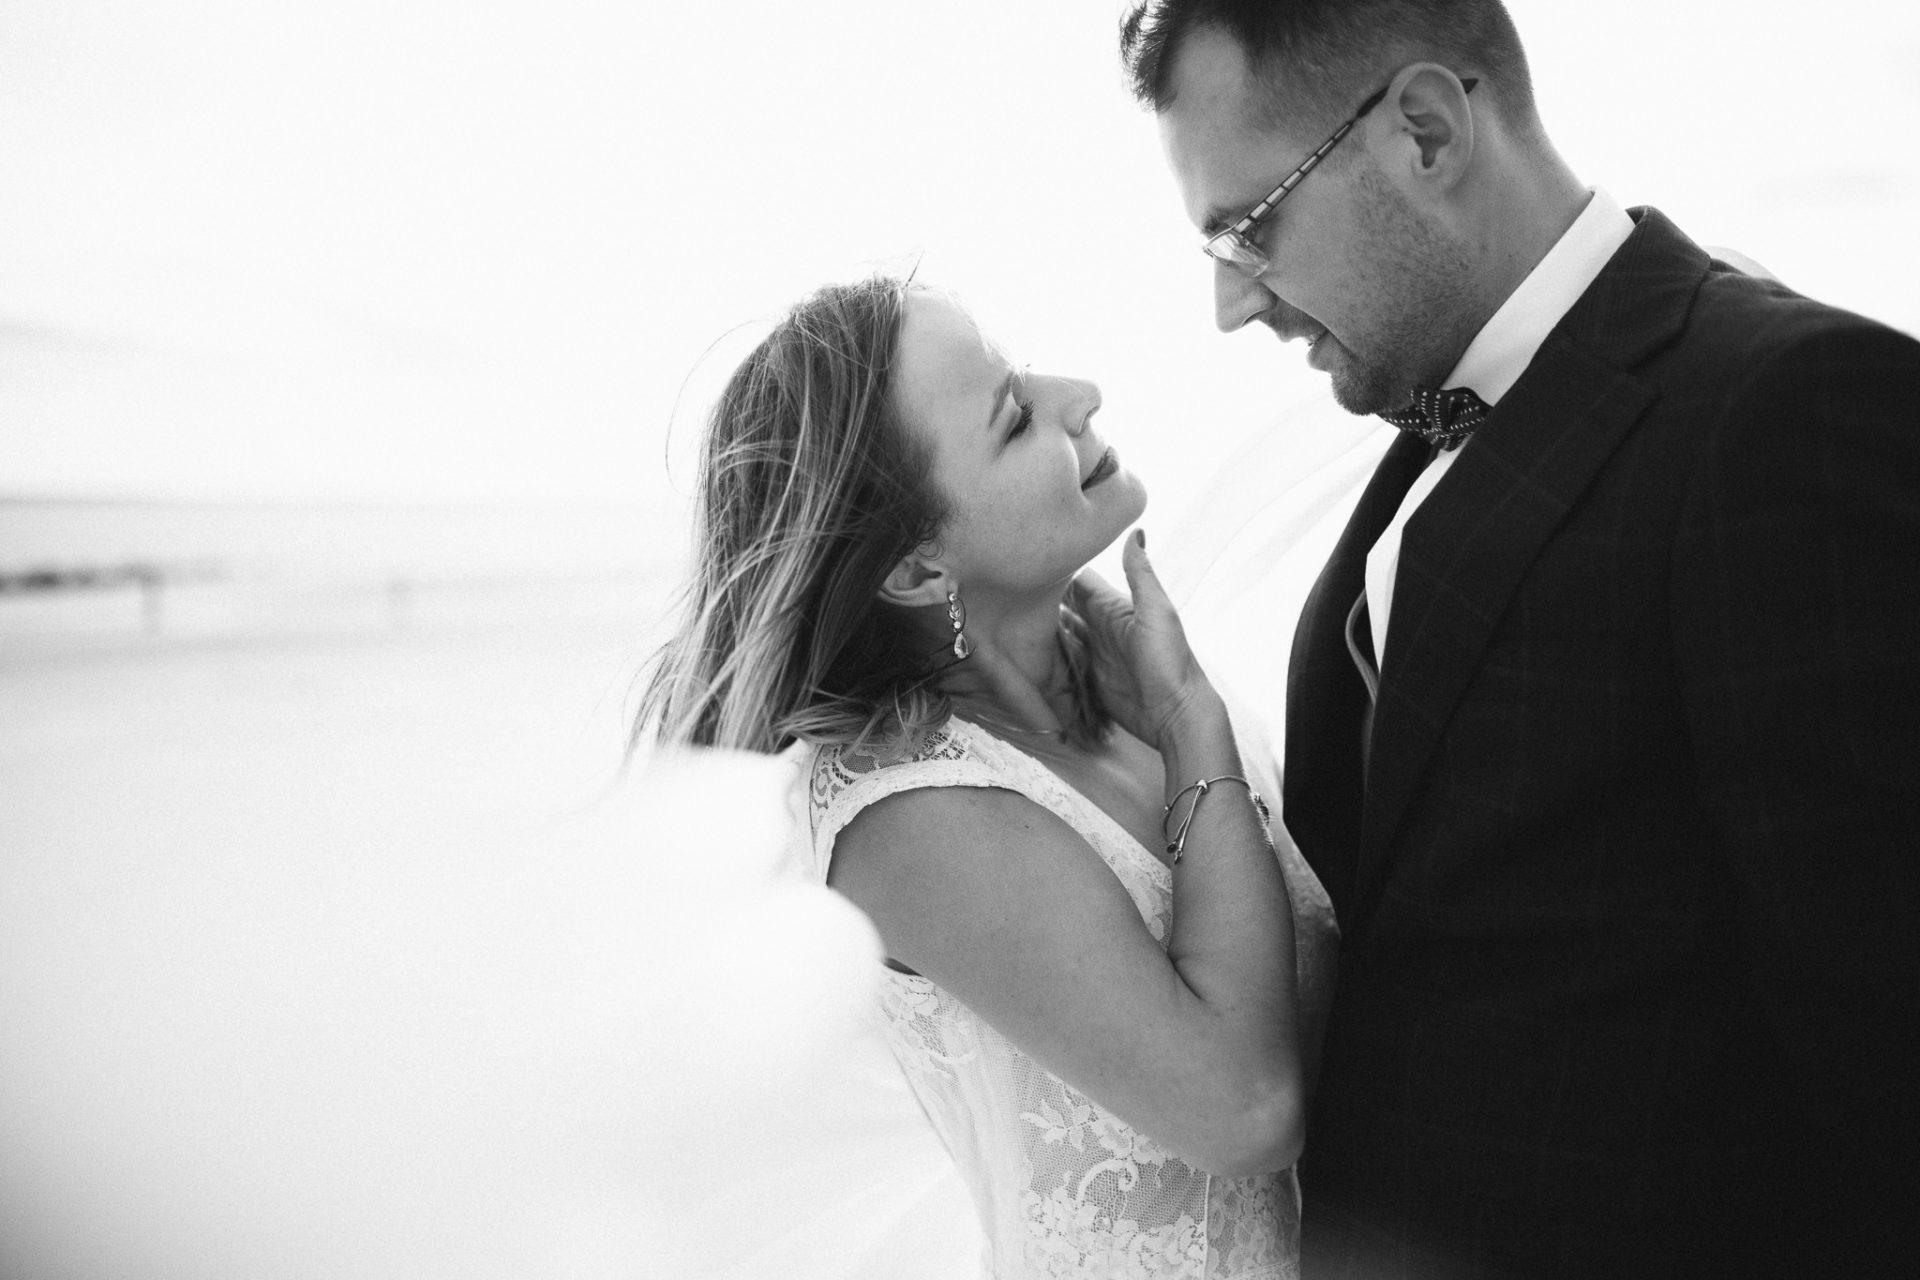 plener-ślubny-na-wydmach-fotograf-ślubny-trójmiasto